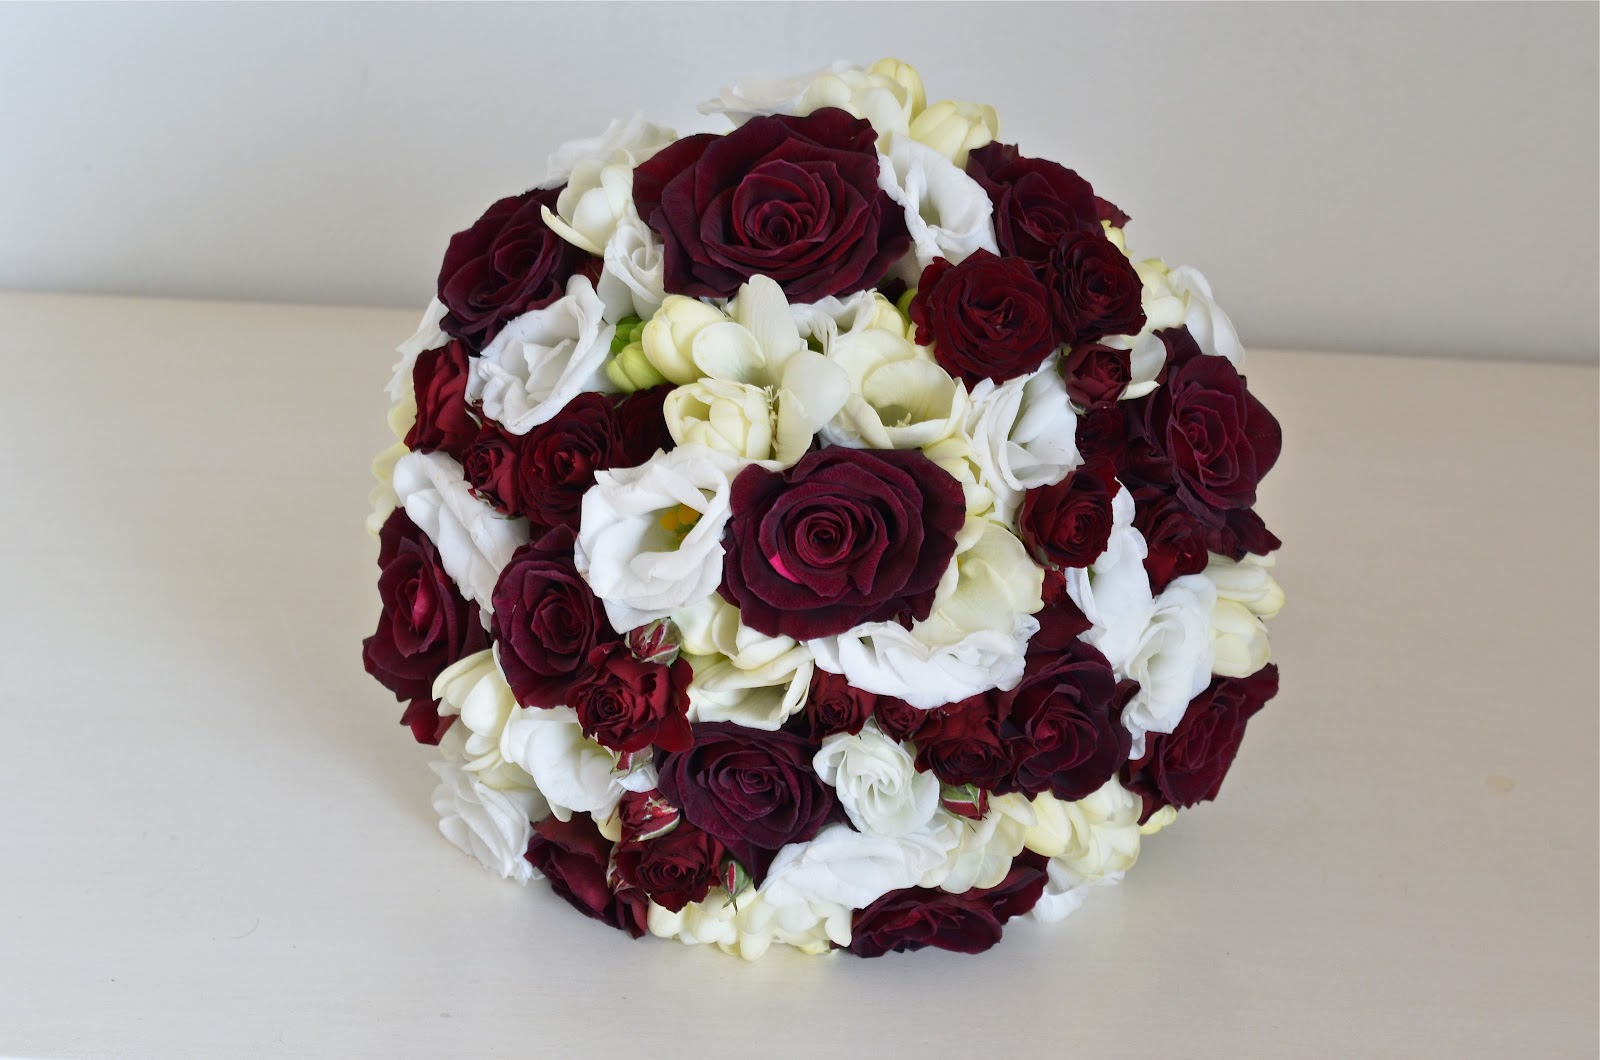 Wedding flowers blog tas burgundy and white wedding flowers wedding flowers blog tas burgundy and white wedding flowers elmers court hotel mightylinksfo